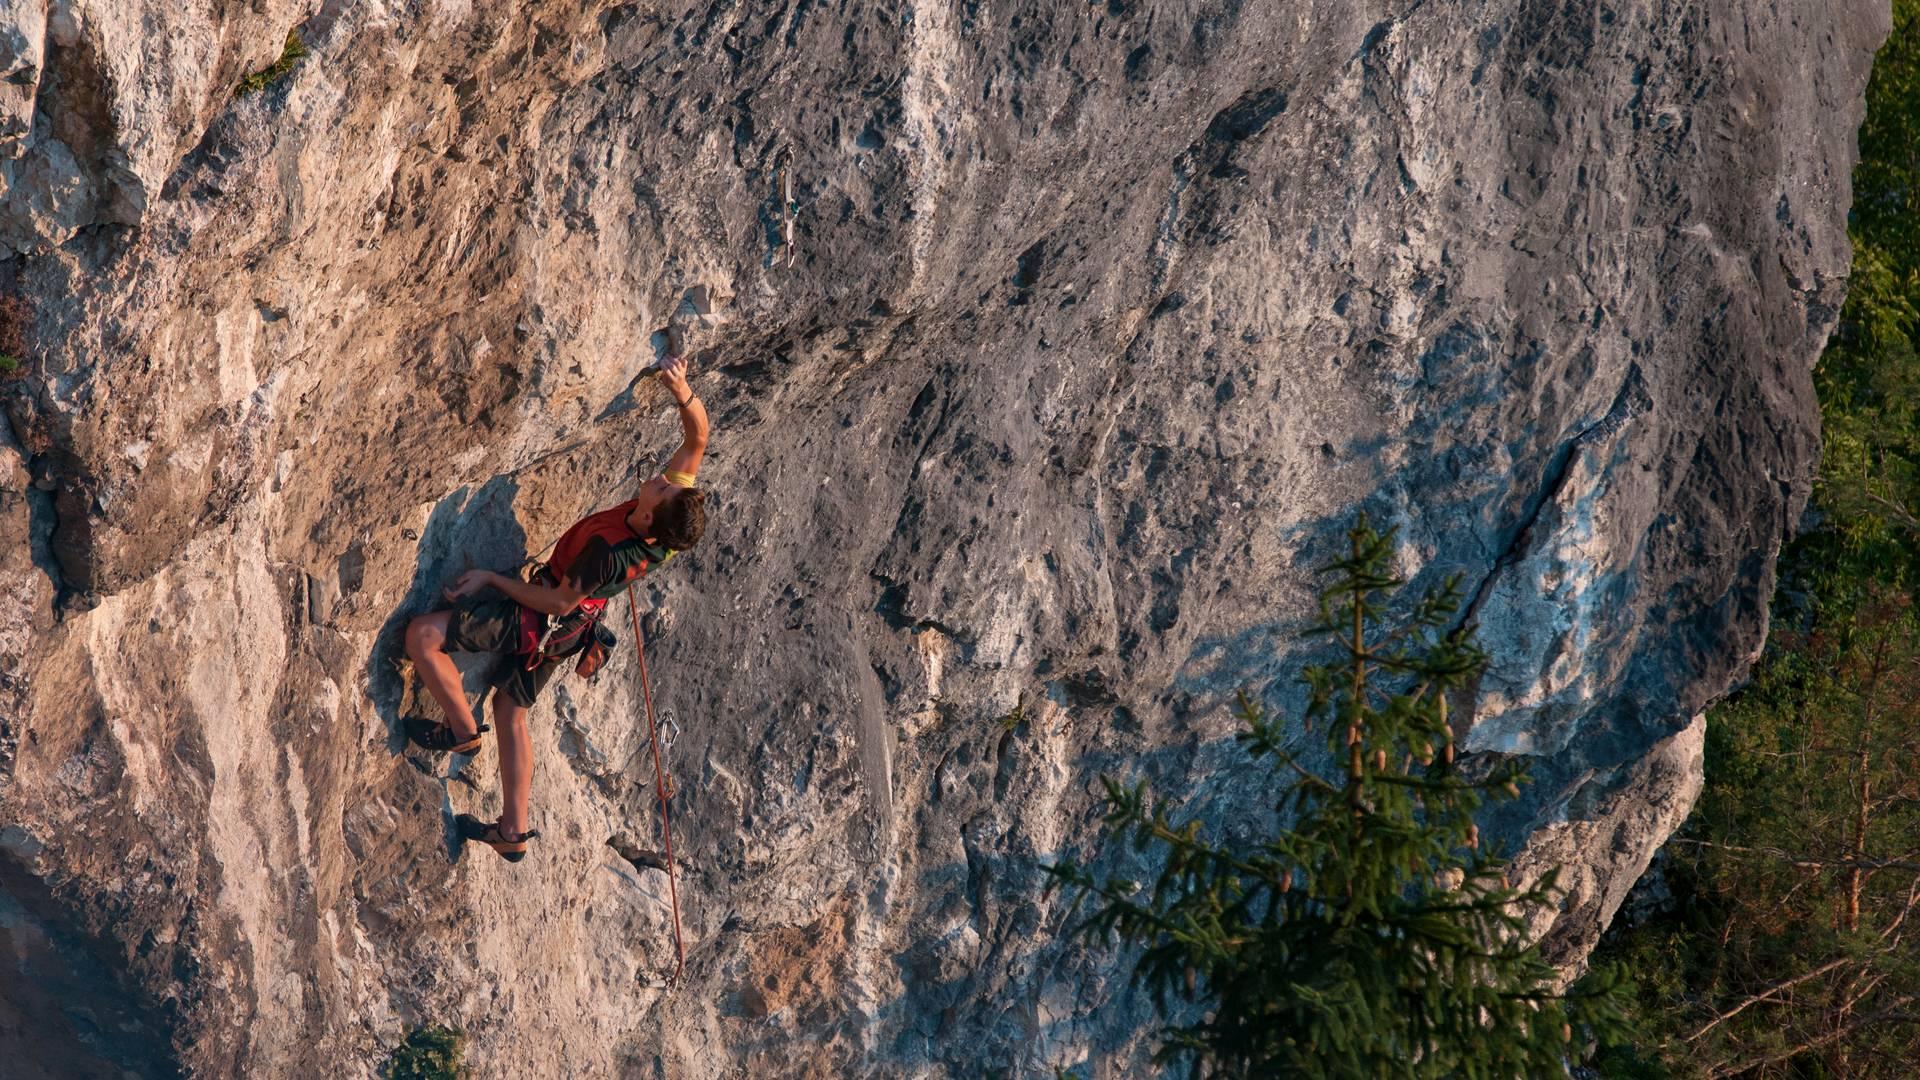 <p>Klettern in Kärnten, Kanzianiberg</p>